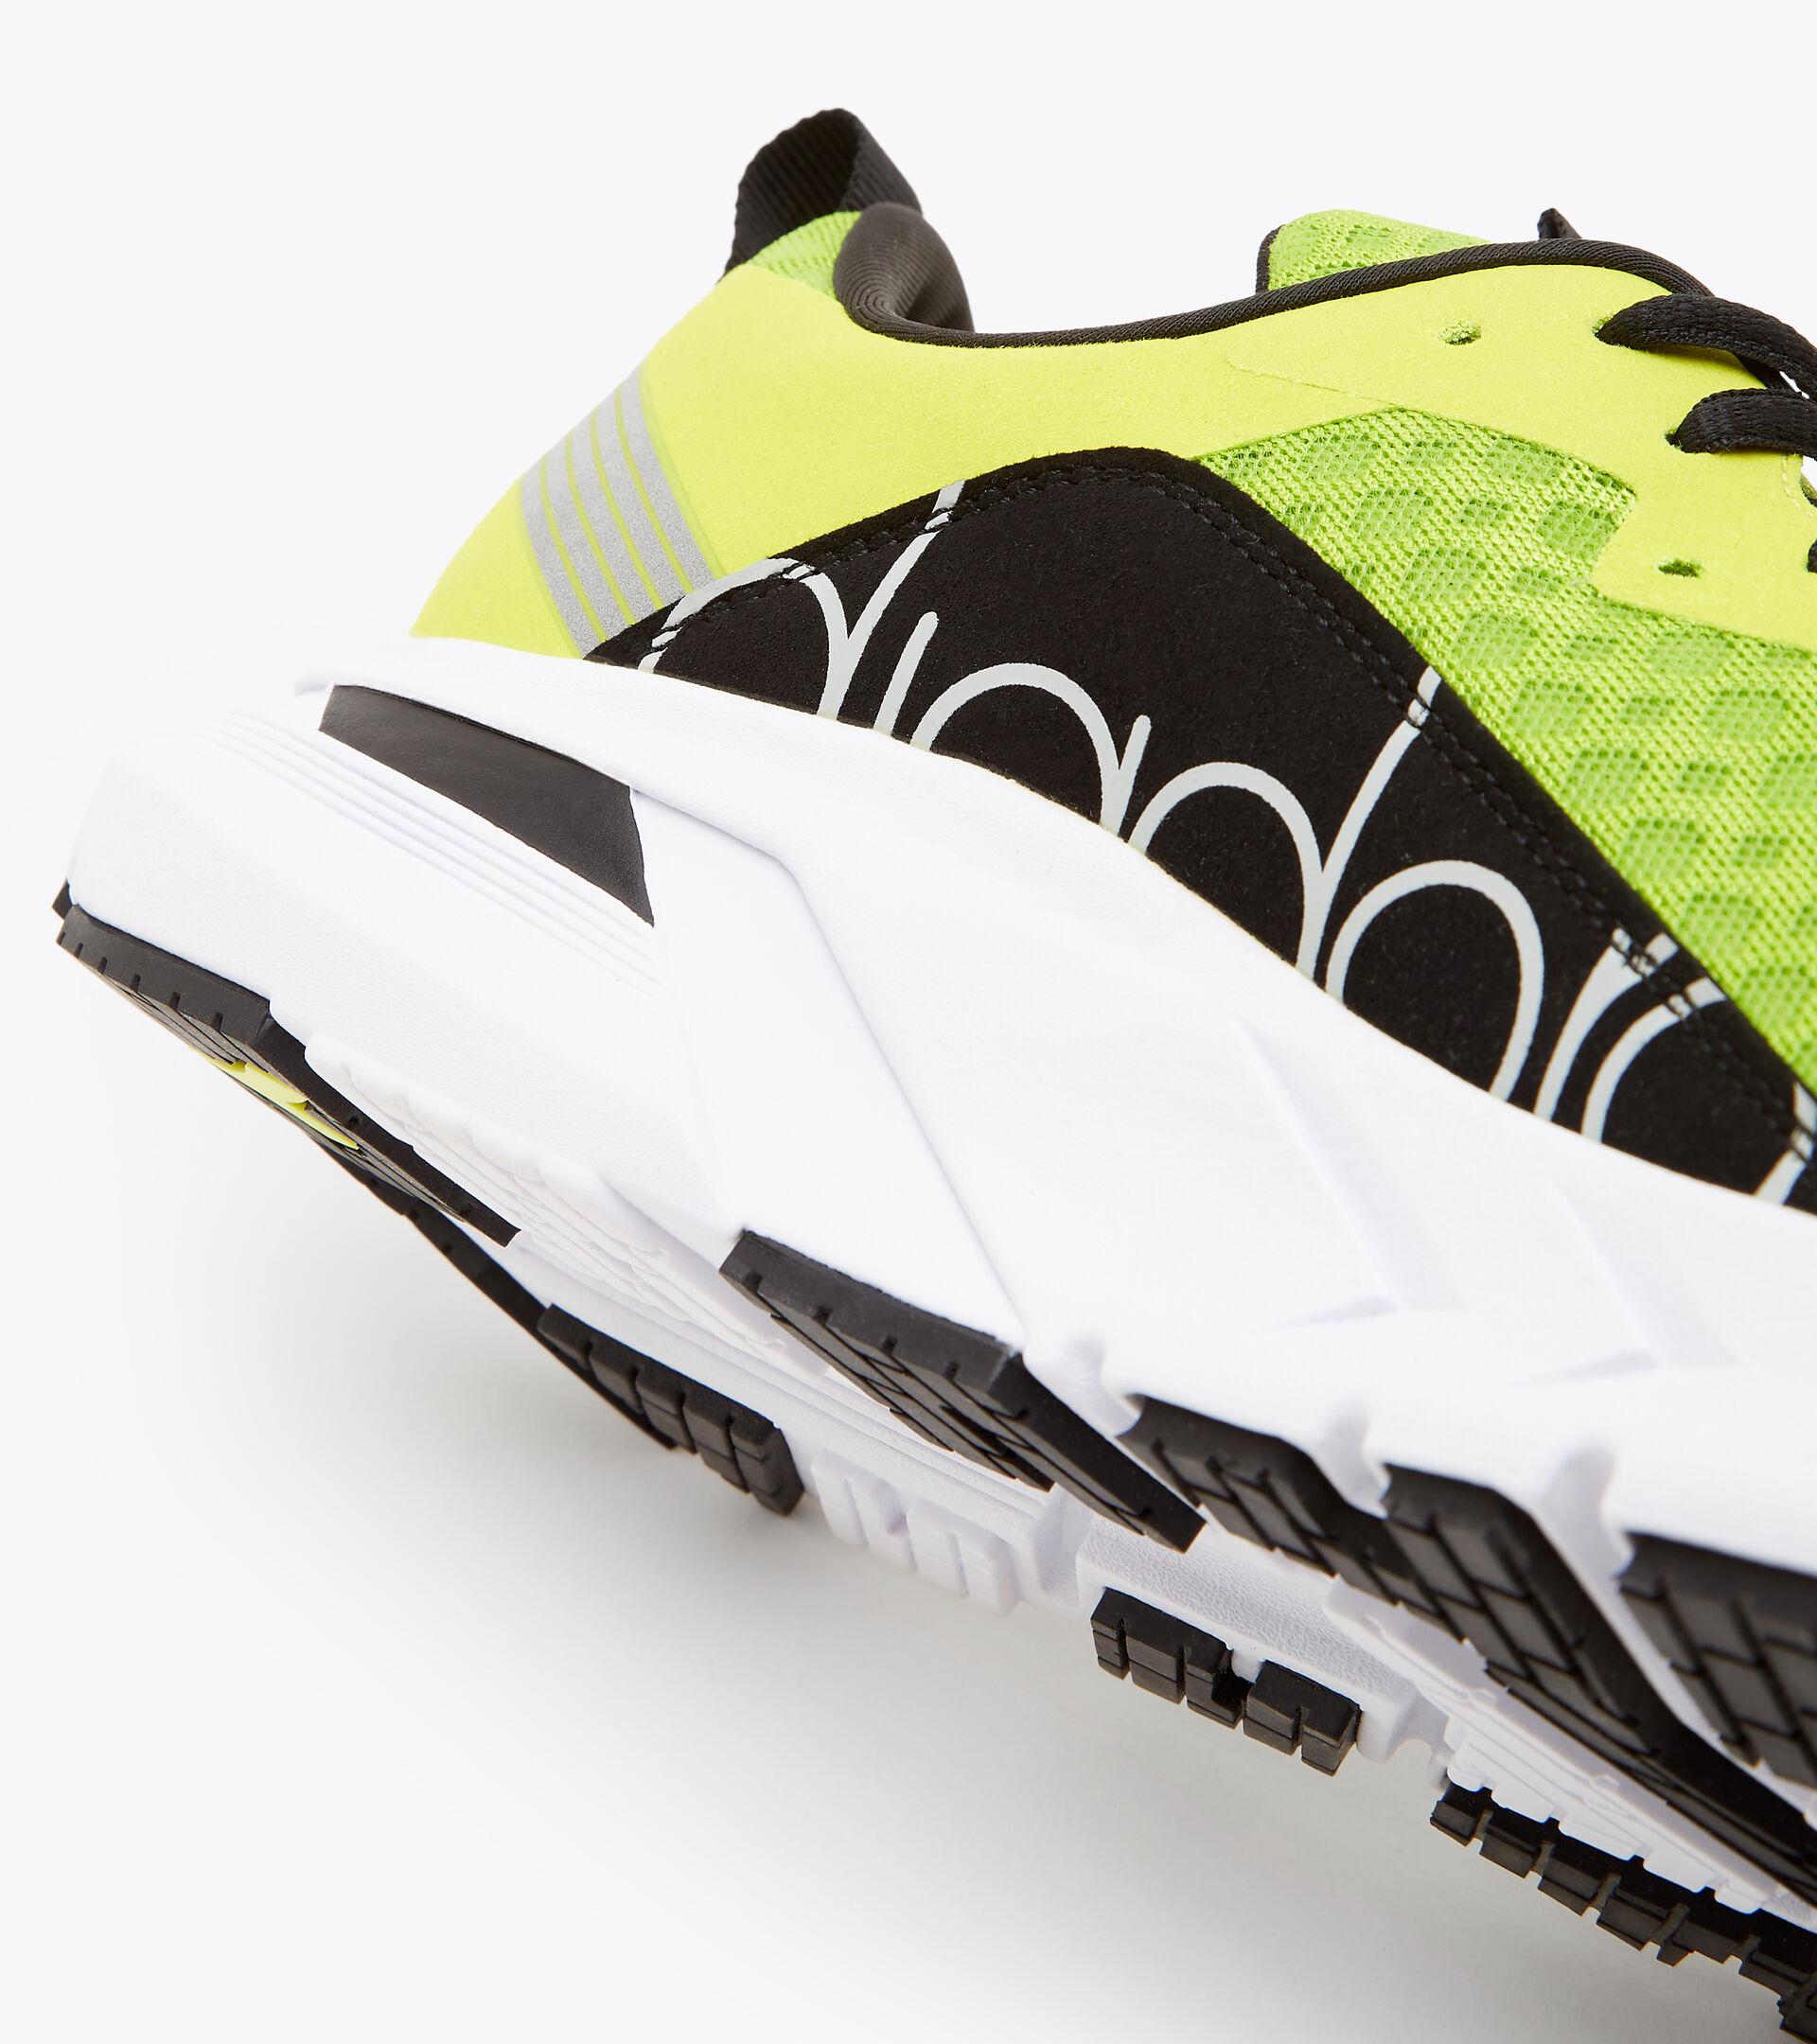 Running shoe - Men's MYTHOS BLUSHIELD VOLO LIME GRN/SULPHUR SPRING/BLACK - Diadora